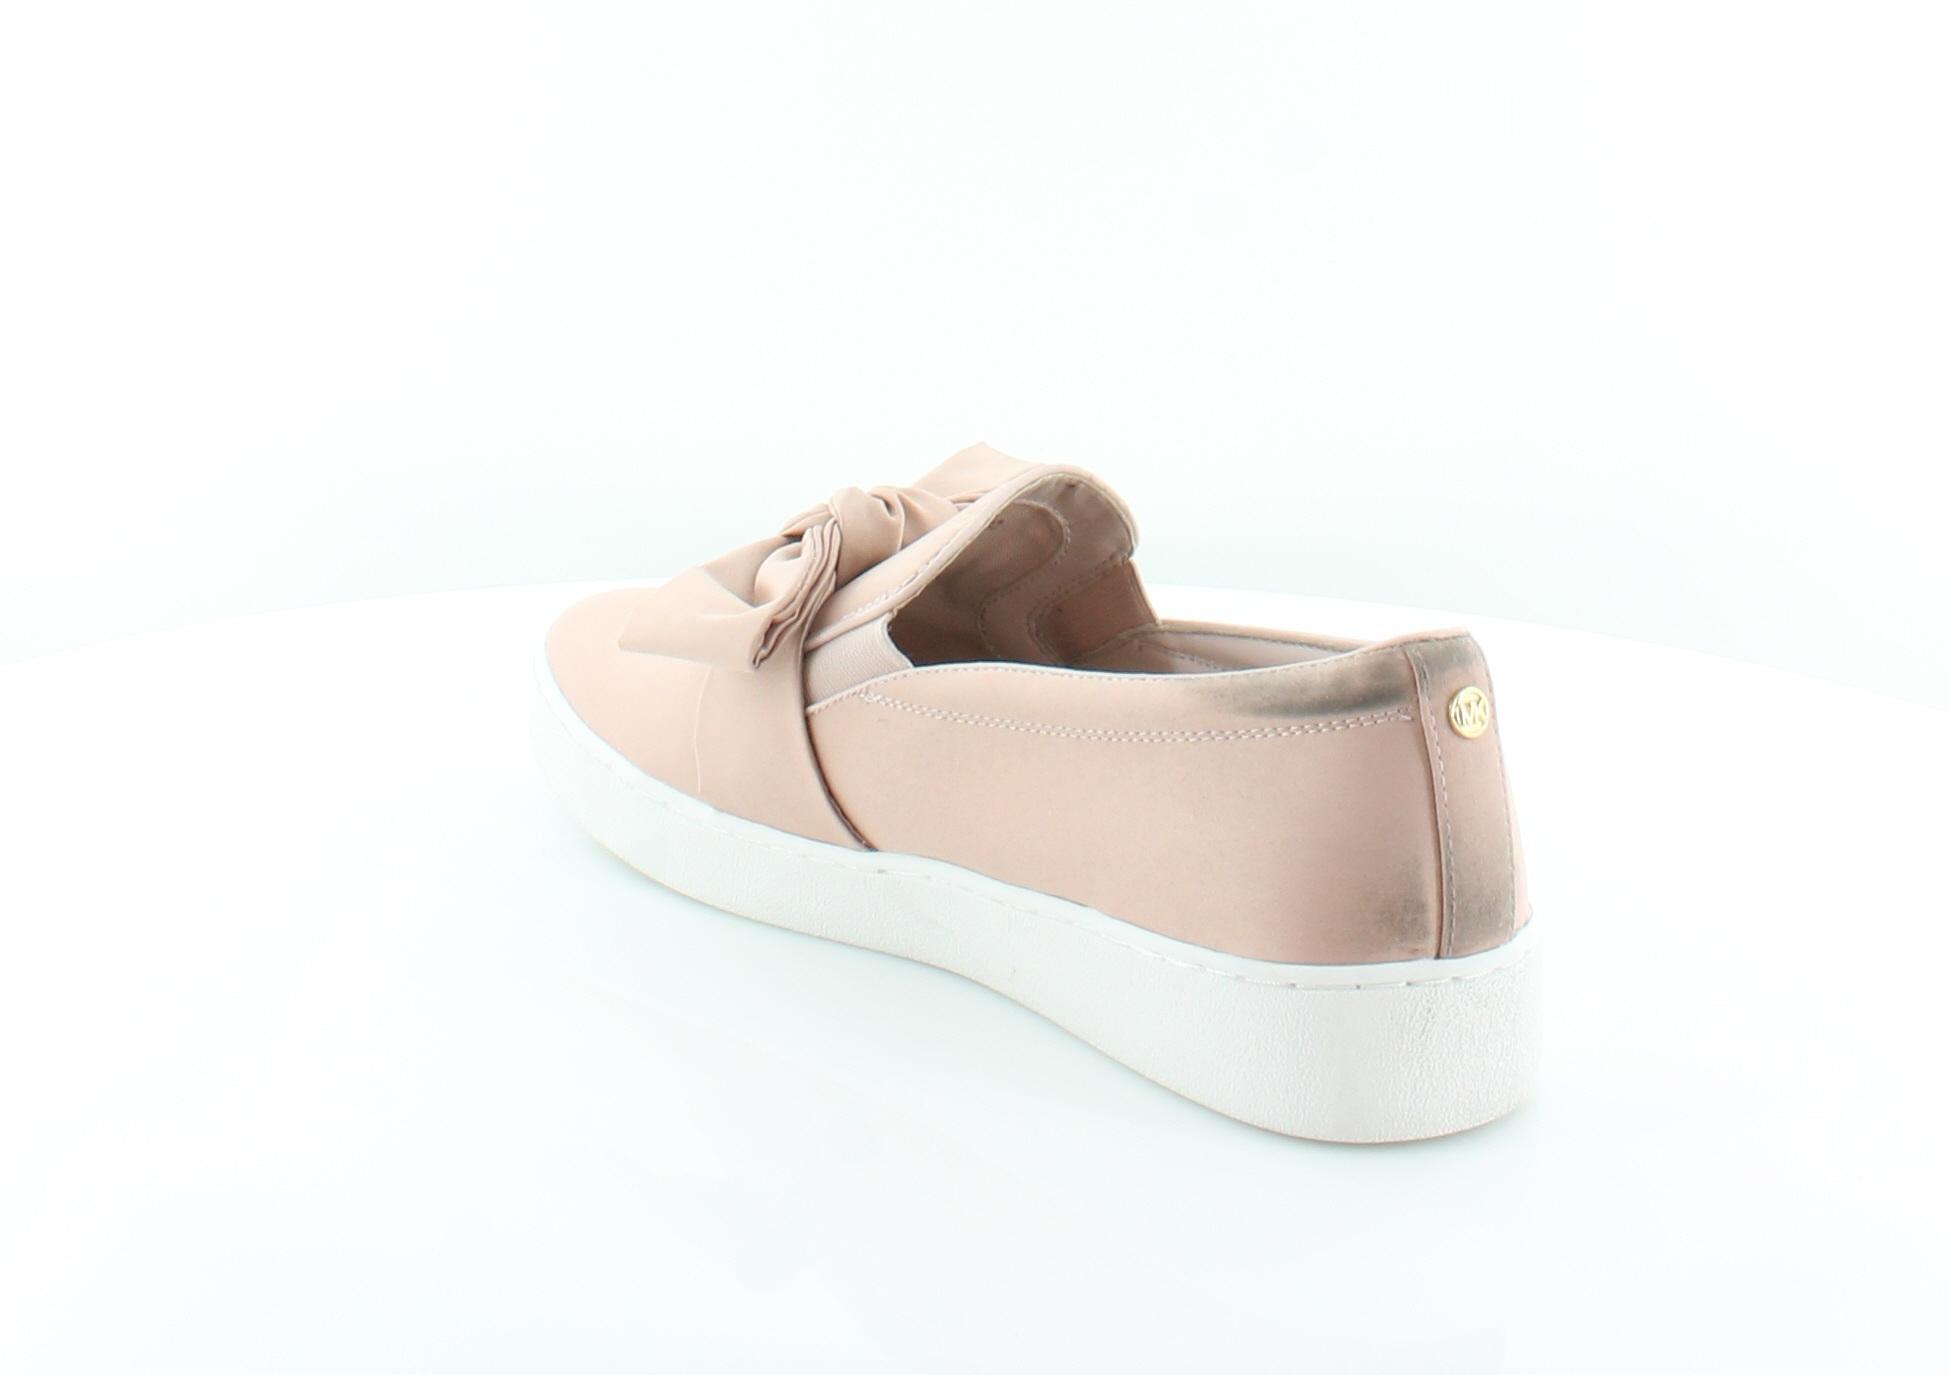 56152ddcb4c9 Michael Kors Willa Slip On Pink Womens Shoes 10 M Fashion Sneakers ...